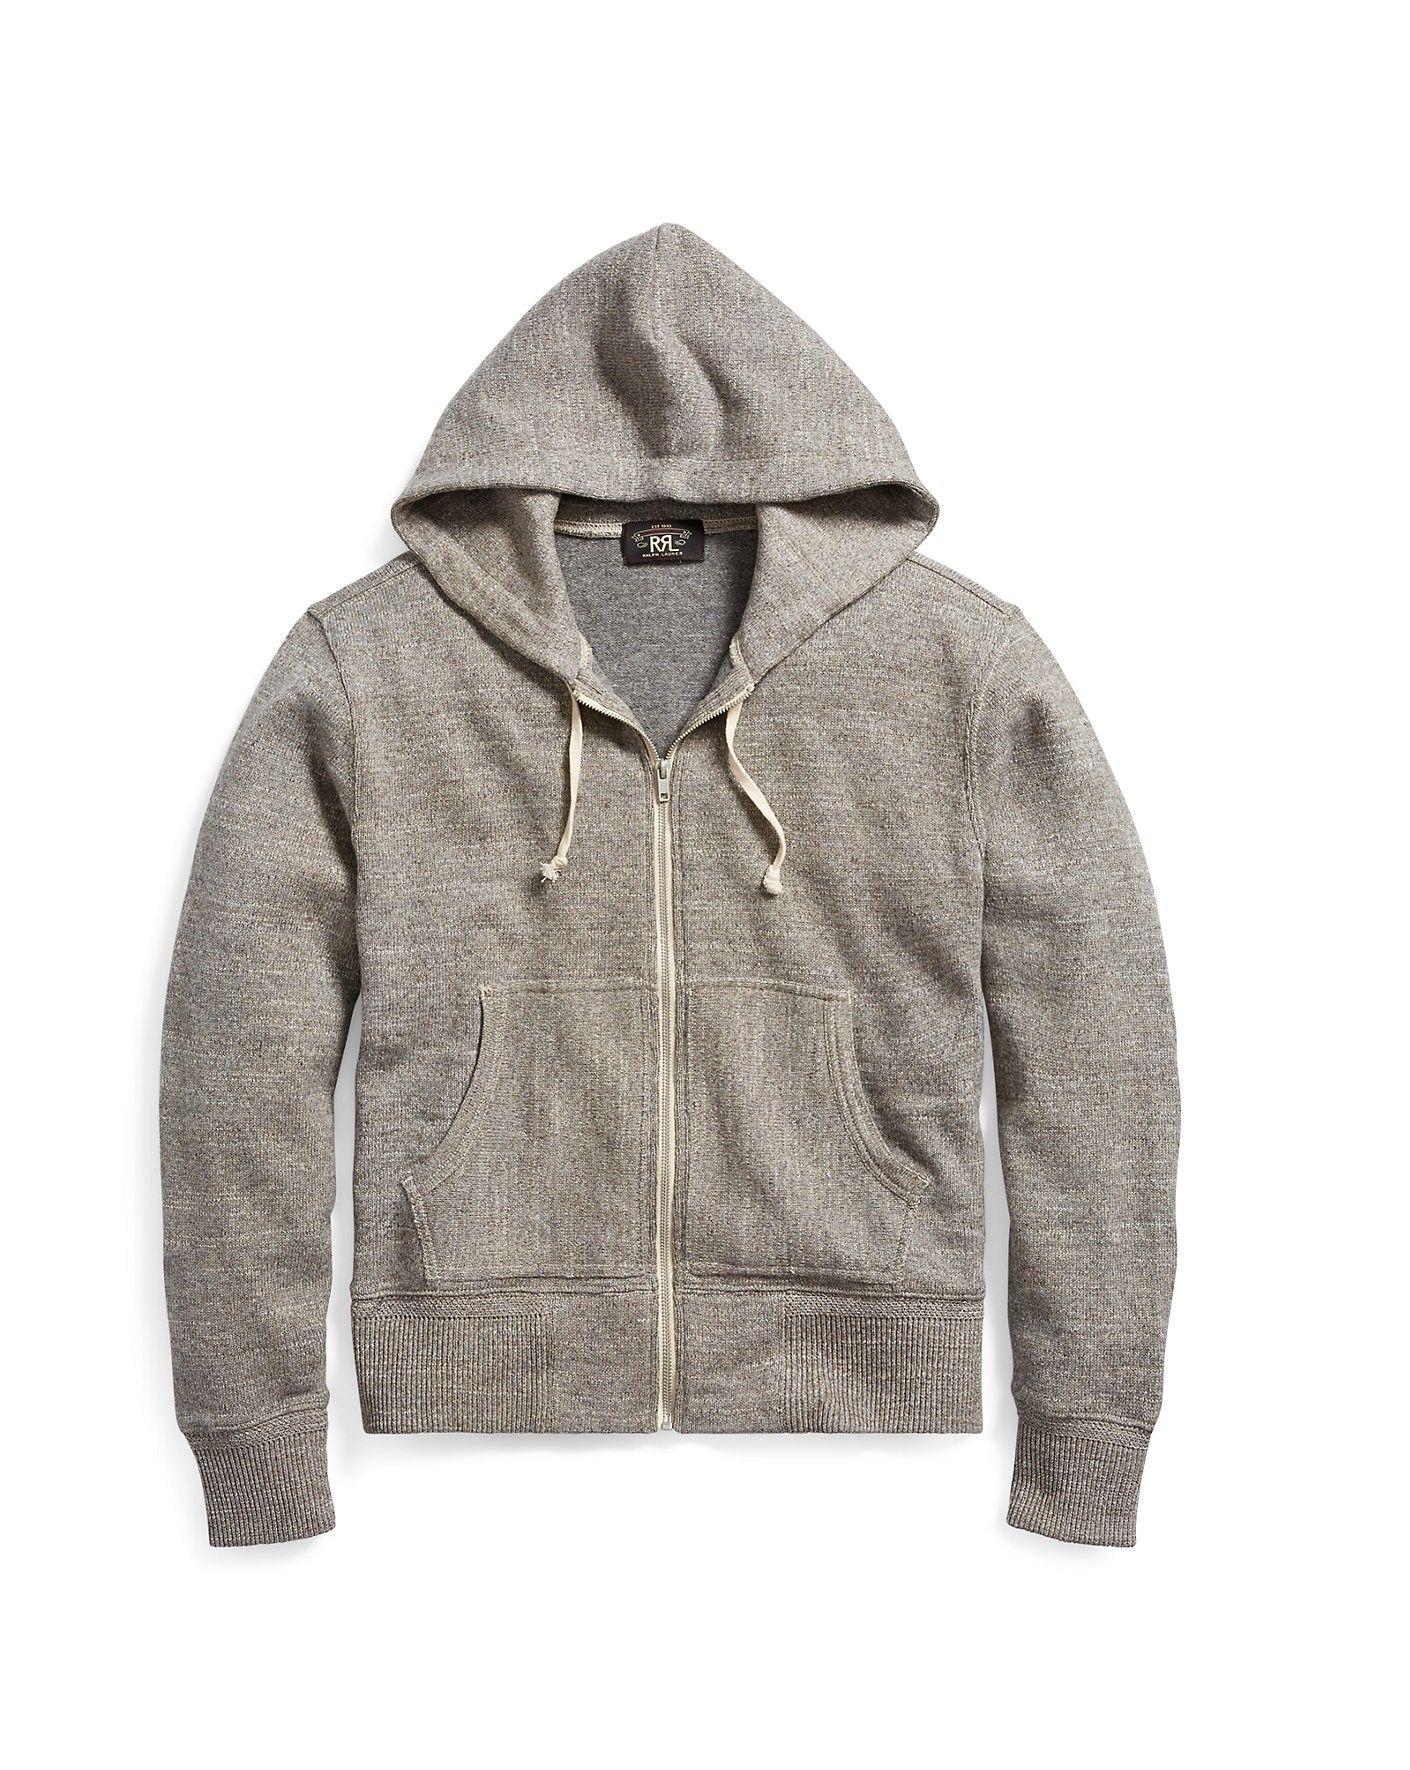 Rrl Cotton Wool Hoodie Light Grey Heather Ralph Lauren Men Polos Hodie Ralphlauren Cloth All